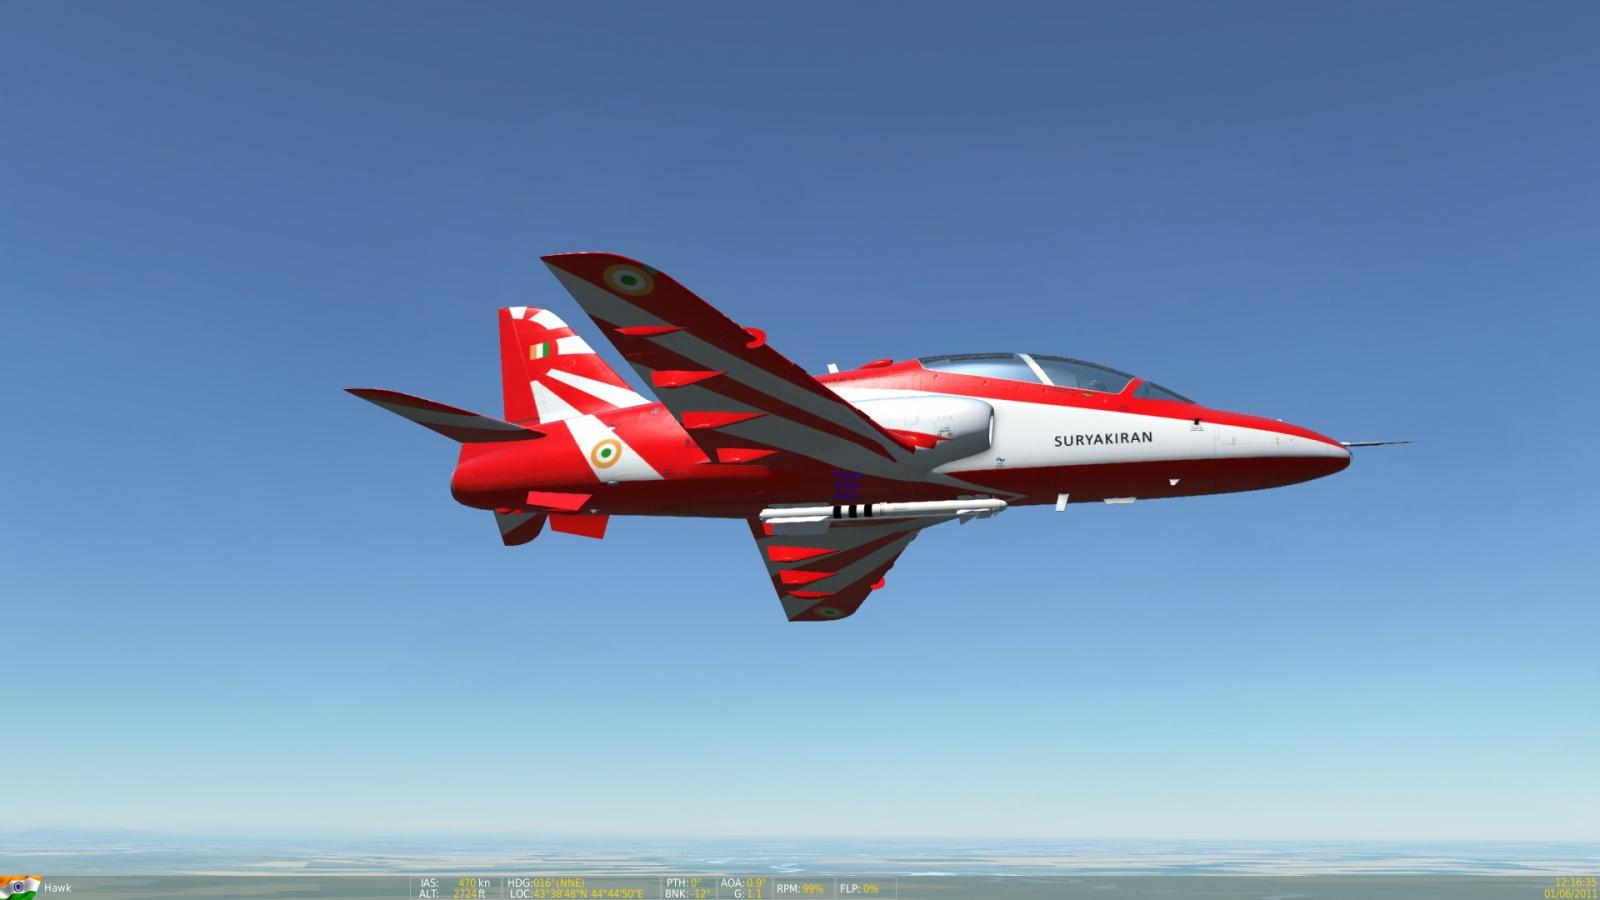 surya kiran demo team (indian air force)